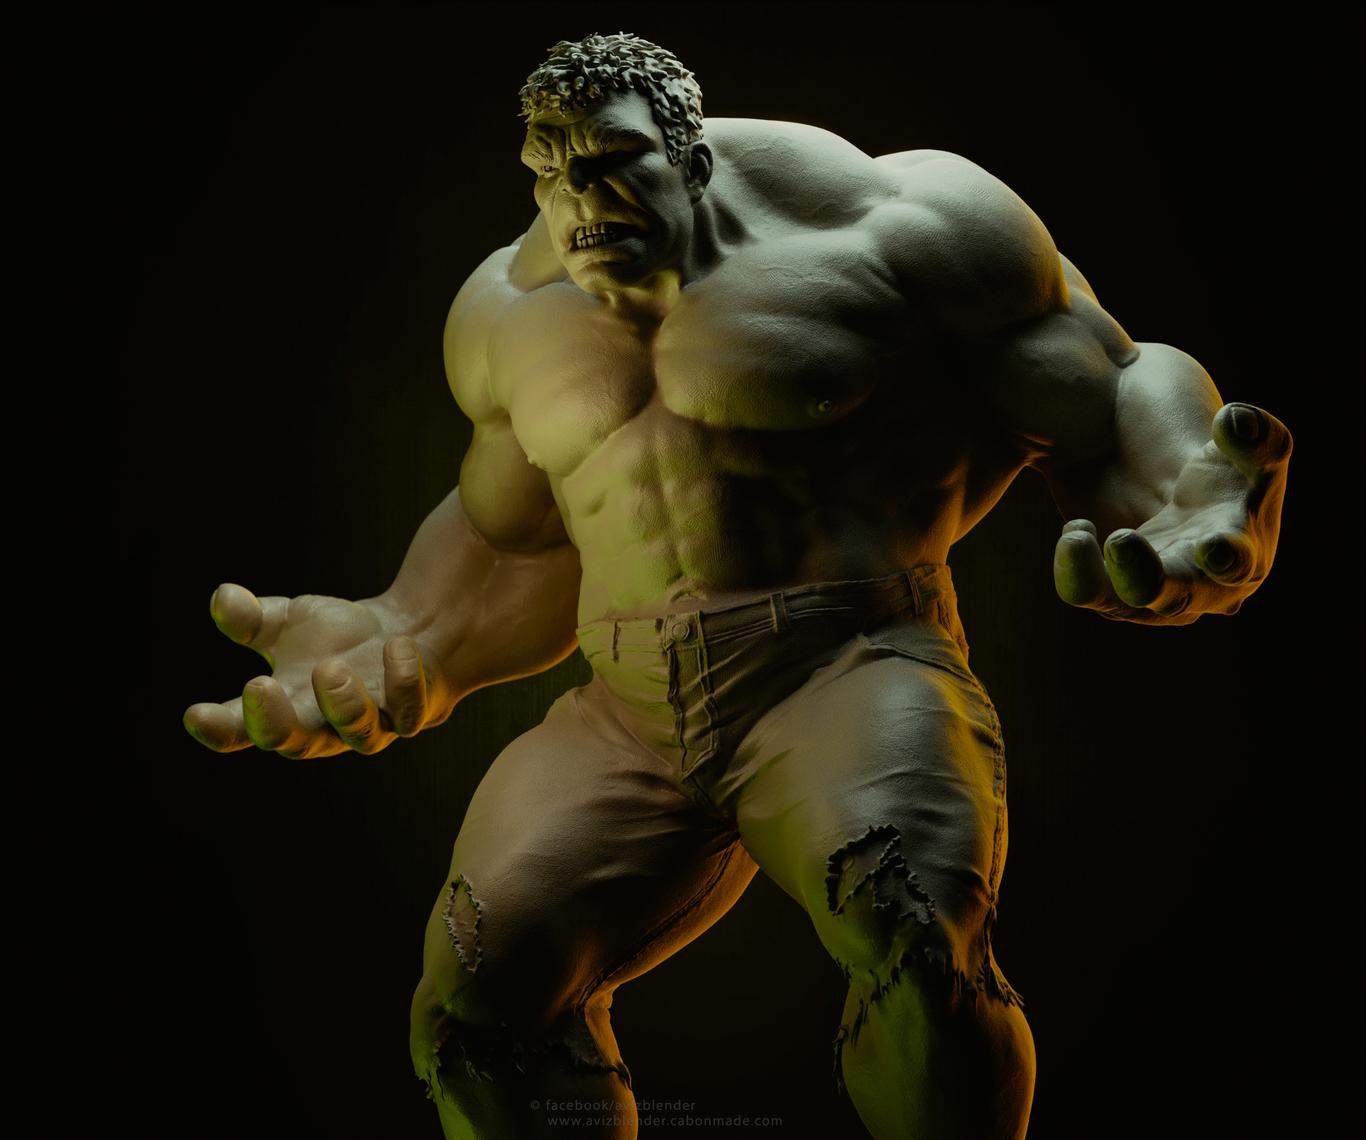 Avbd hulk fan art 1 985dff02 cmwl